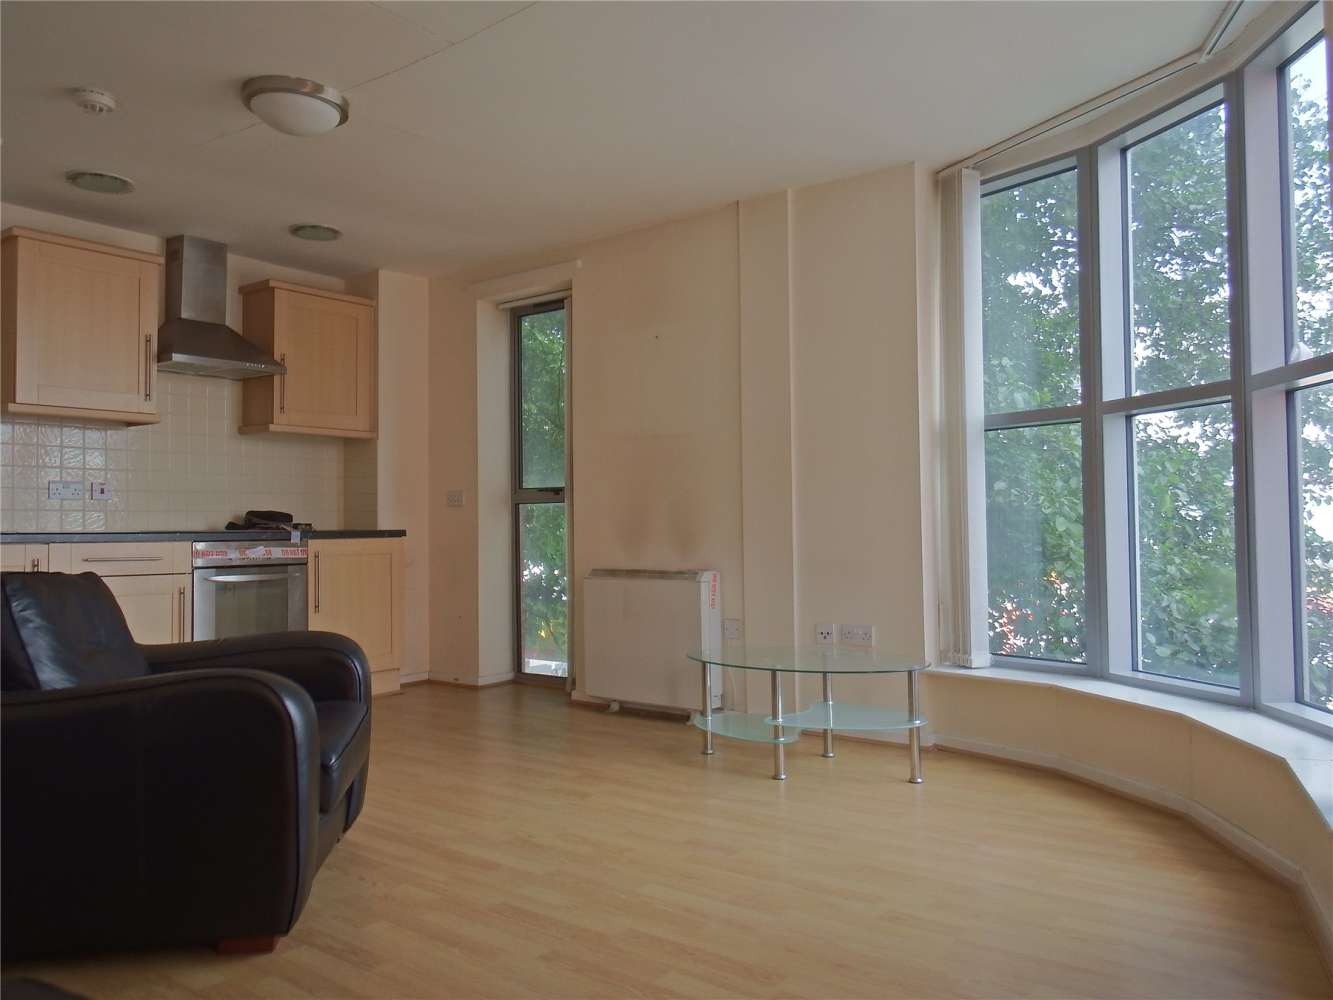 Apartment Leeds, LS2 - Ahlux Court Millwright Street Leeds West Yorkshire - 04